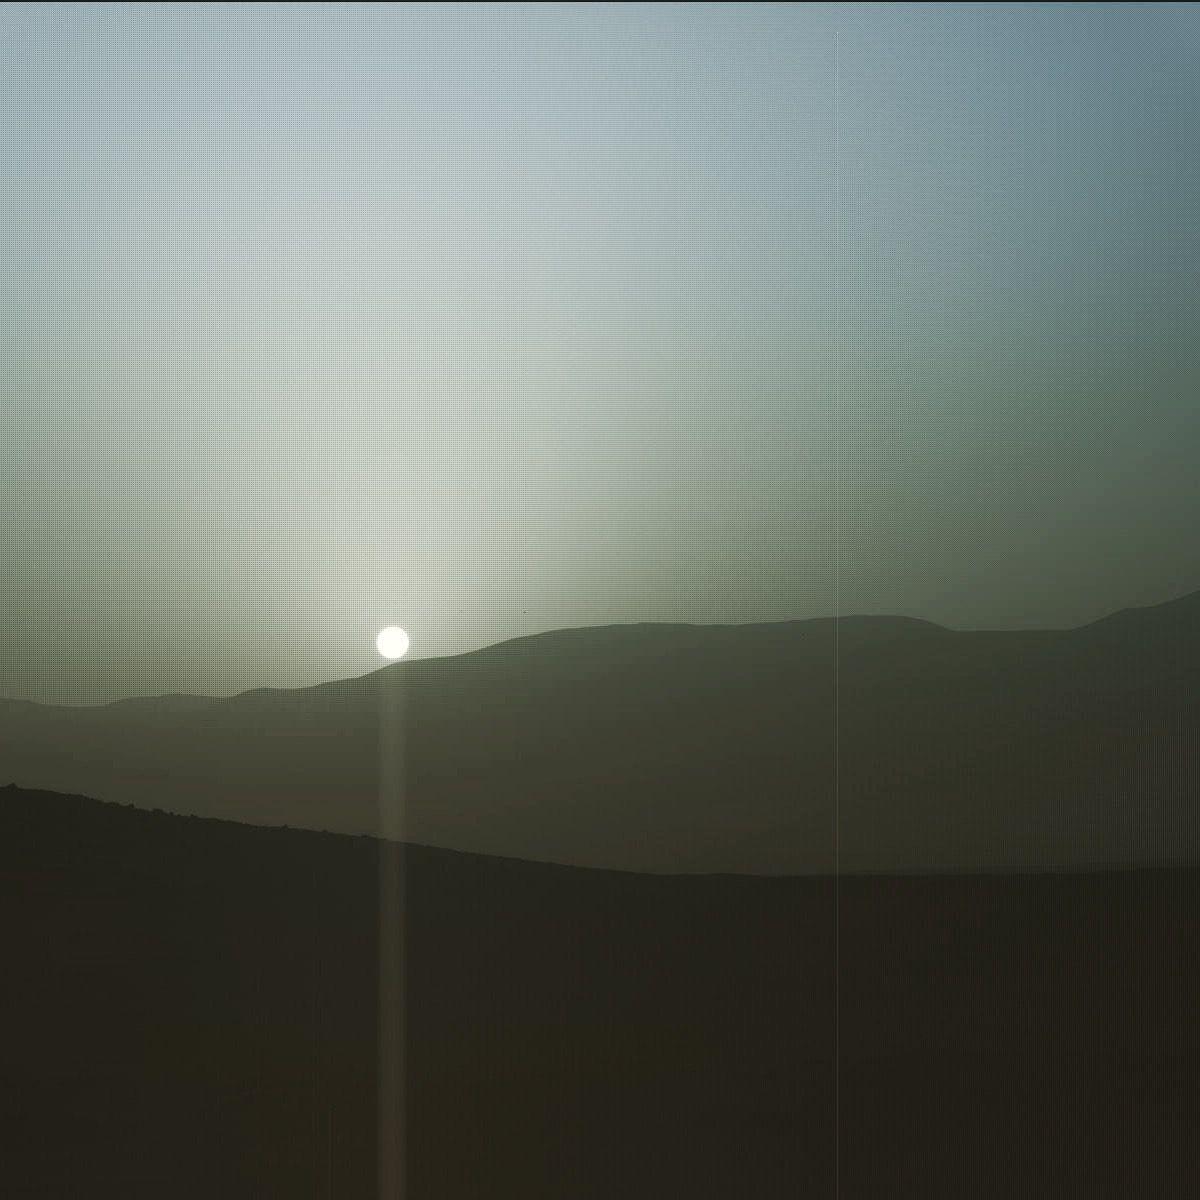 curiosity sunrise sunset times - HD1200×1200